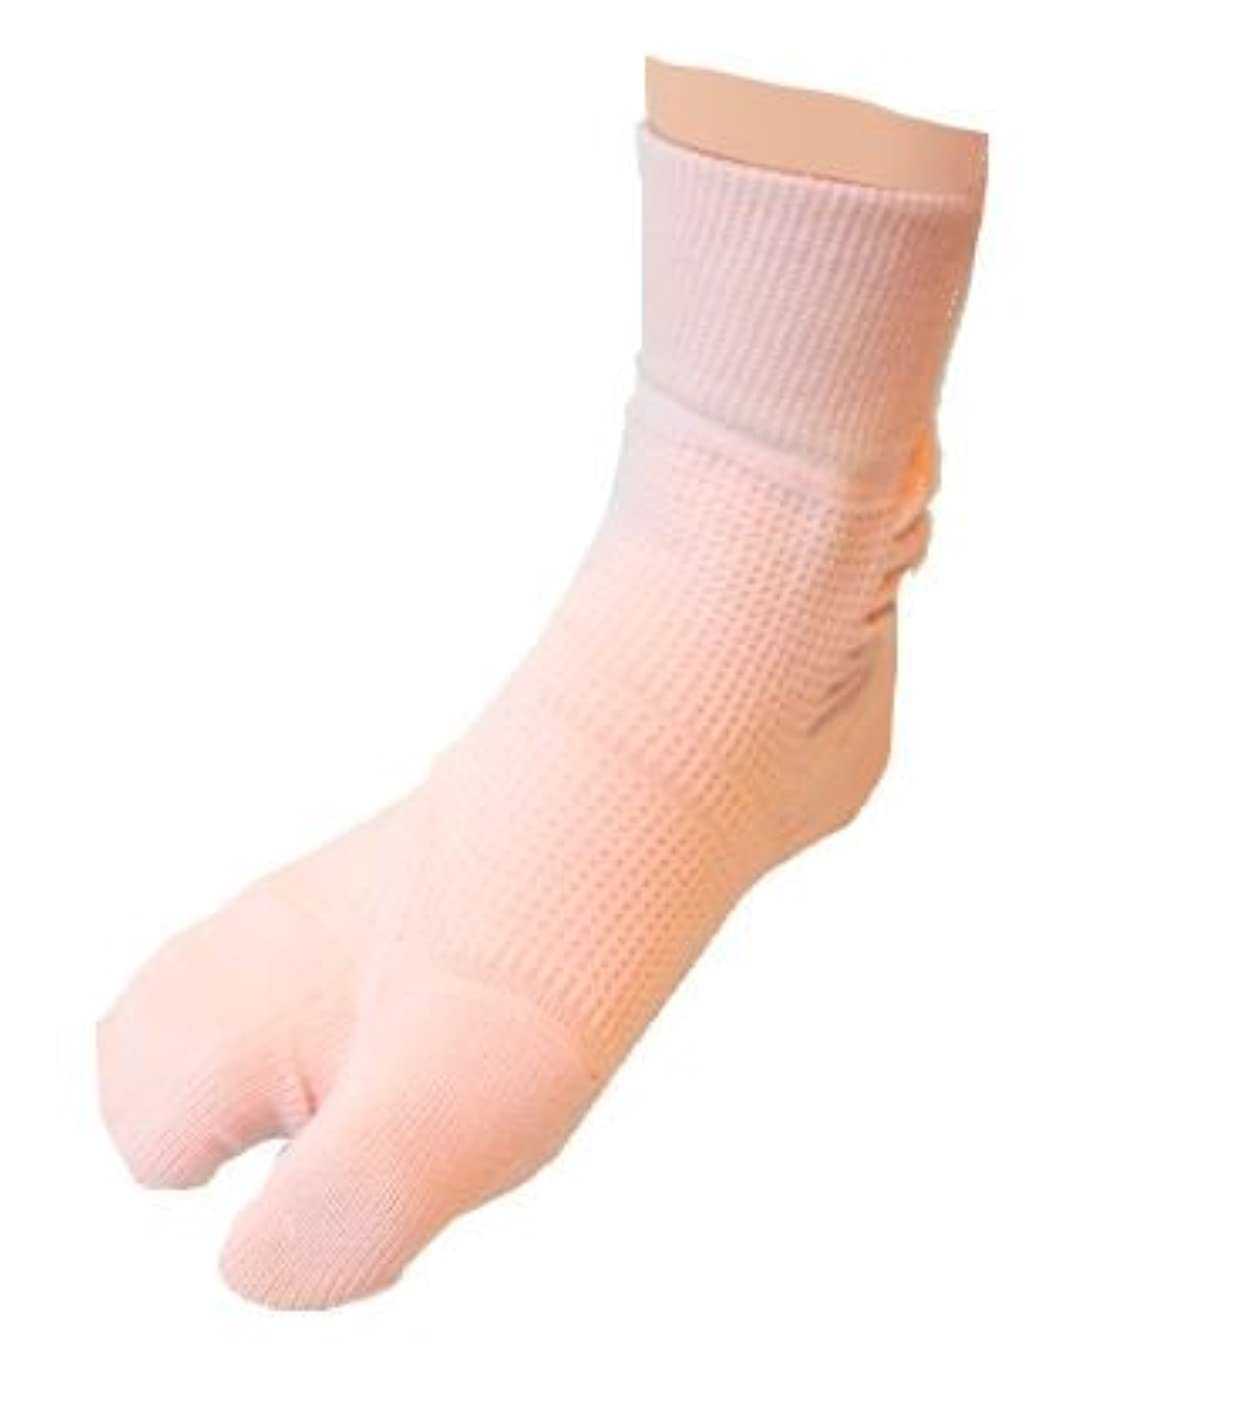 正統派岸何十人も外反母趾対策靴下 同色?同サイズ 2枚組【日本製】 (22-23cm, ピンク)